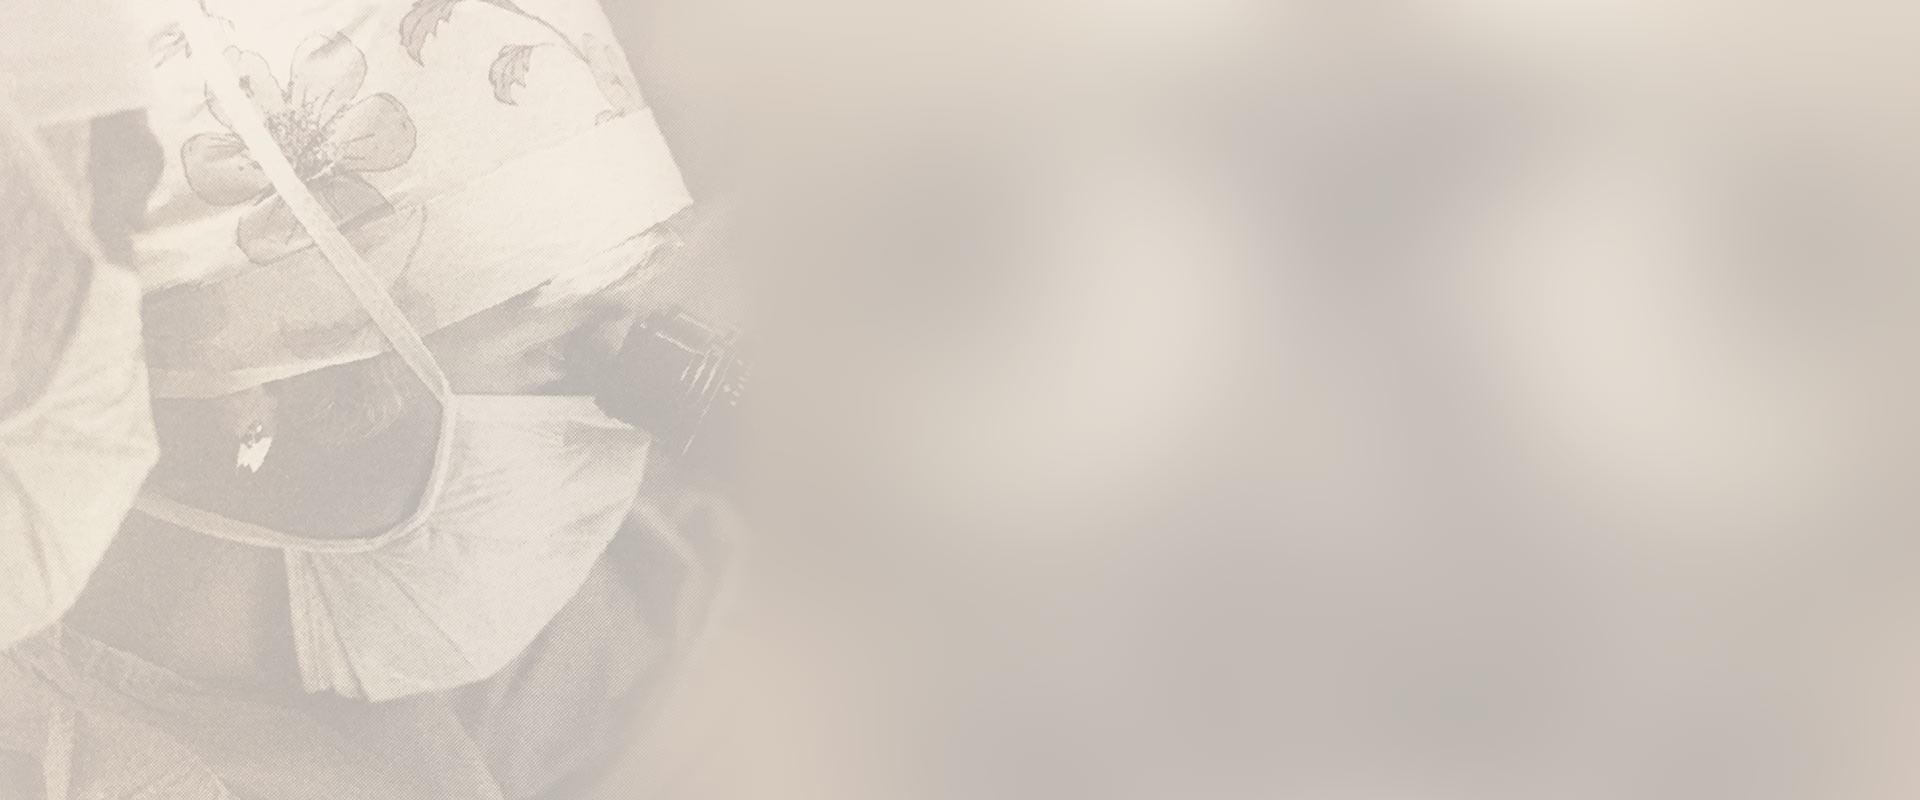 decade white image